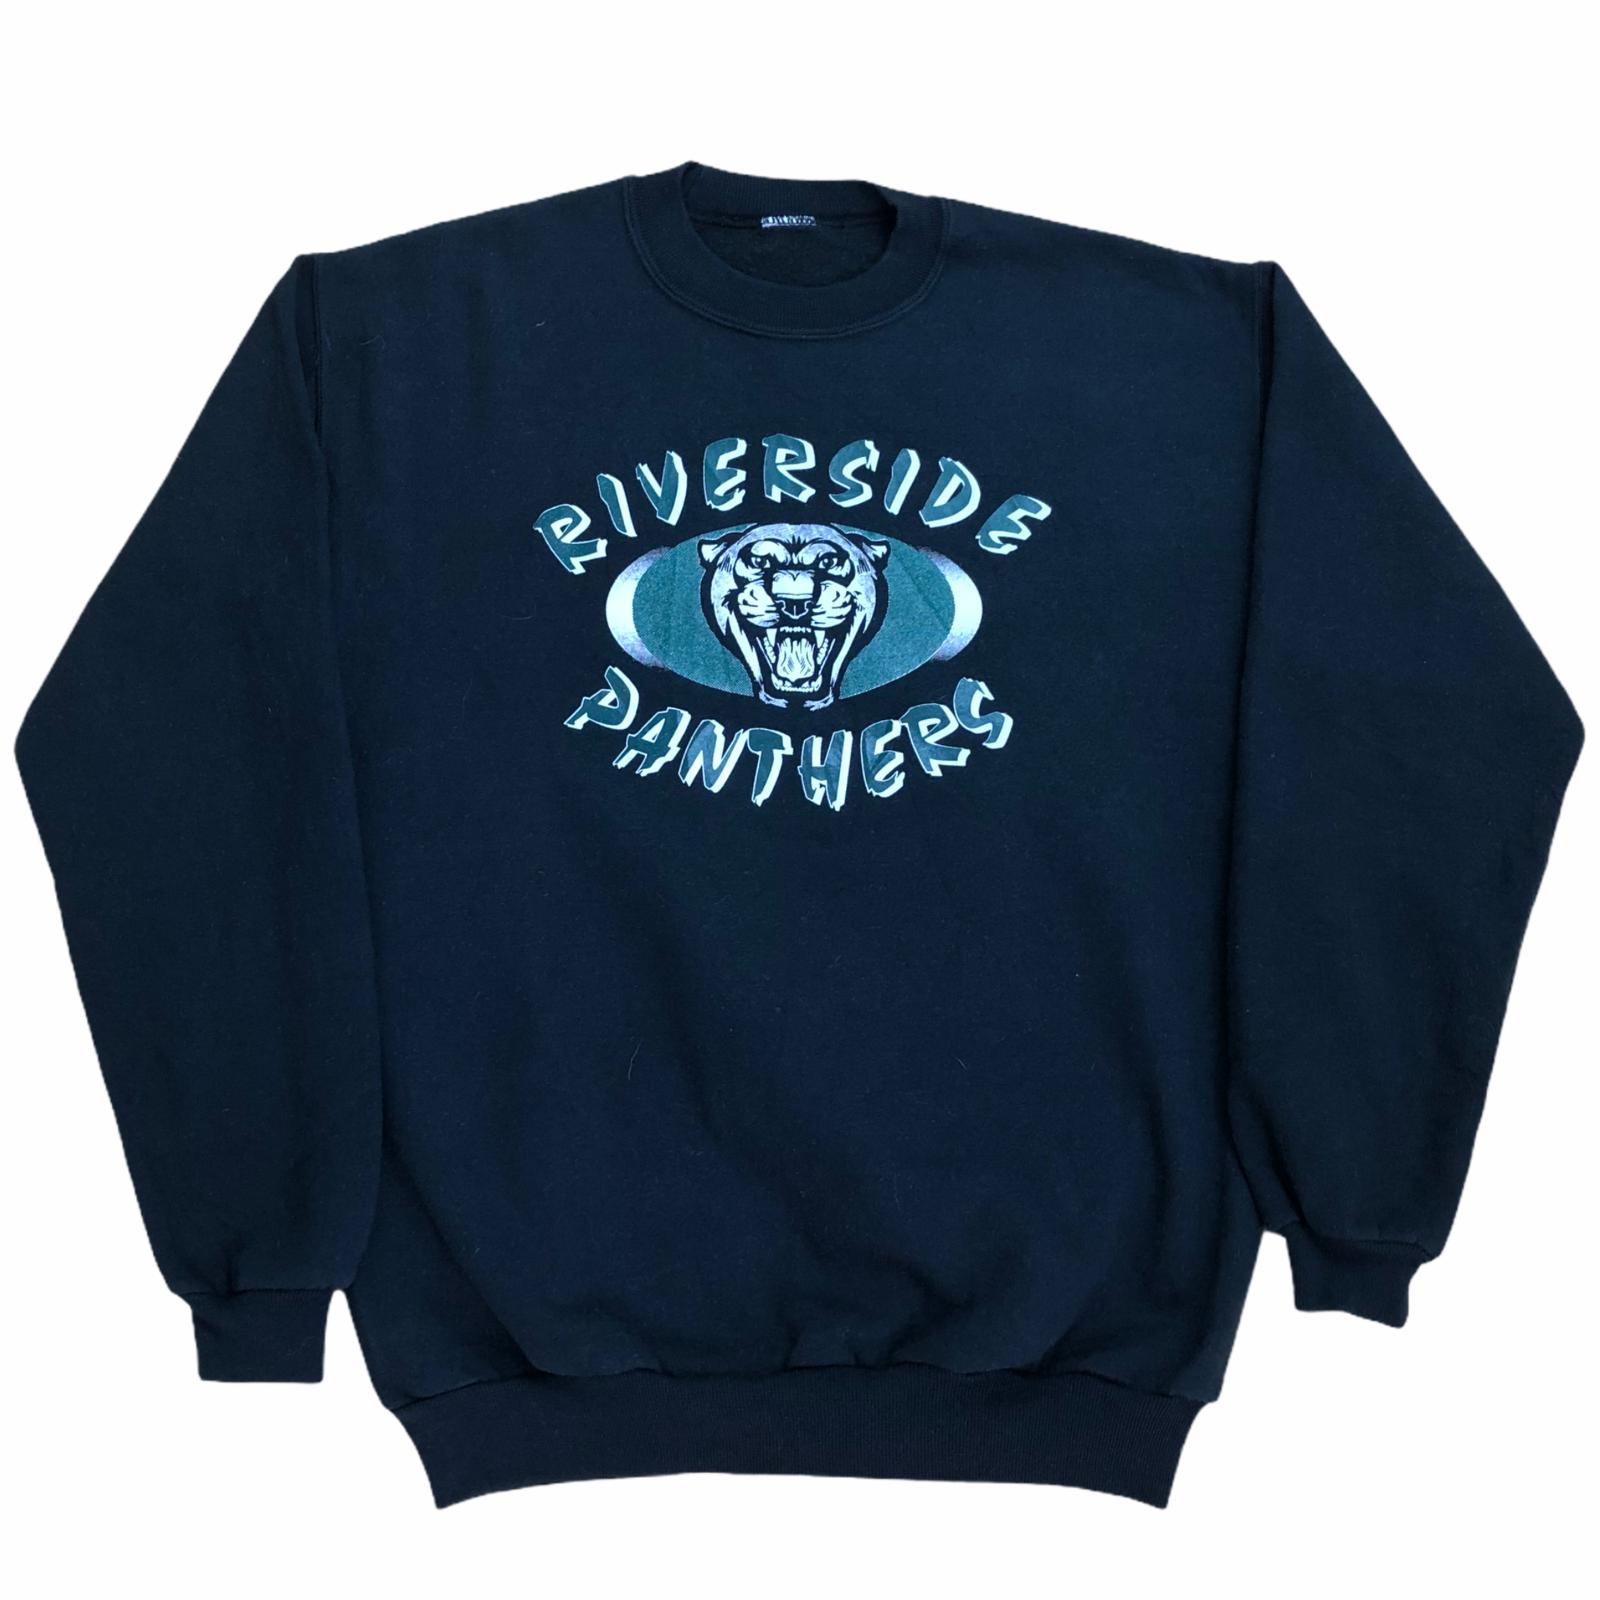 Vintage 90s Riverside Panthers USA Graphic Sweatshirt Jumper Crewneck Size S